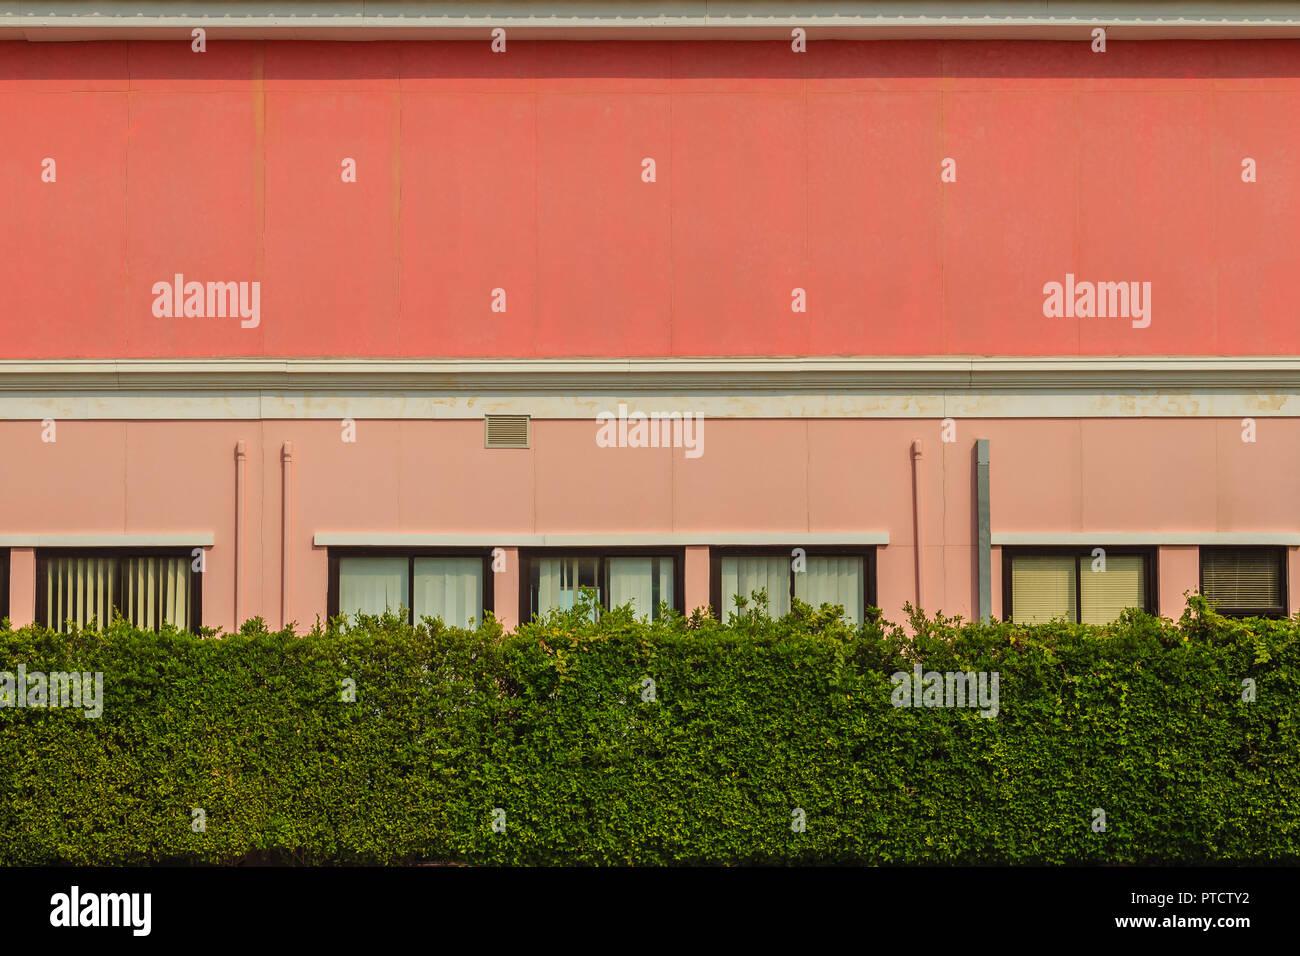 Hecke Zaun Wand Vor Dem Burogebaude Grune Blatter Zaun Gegen